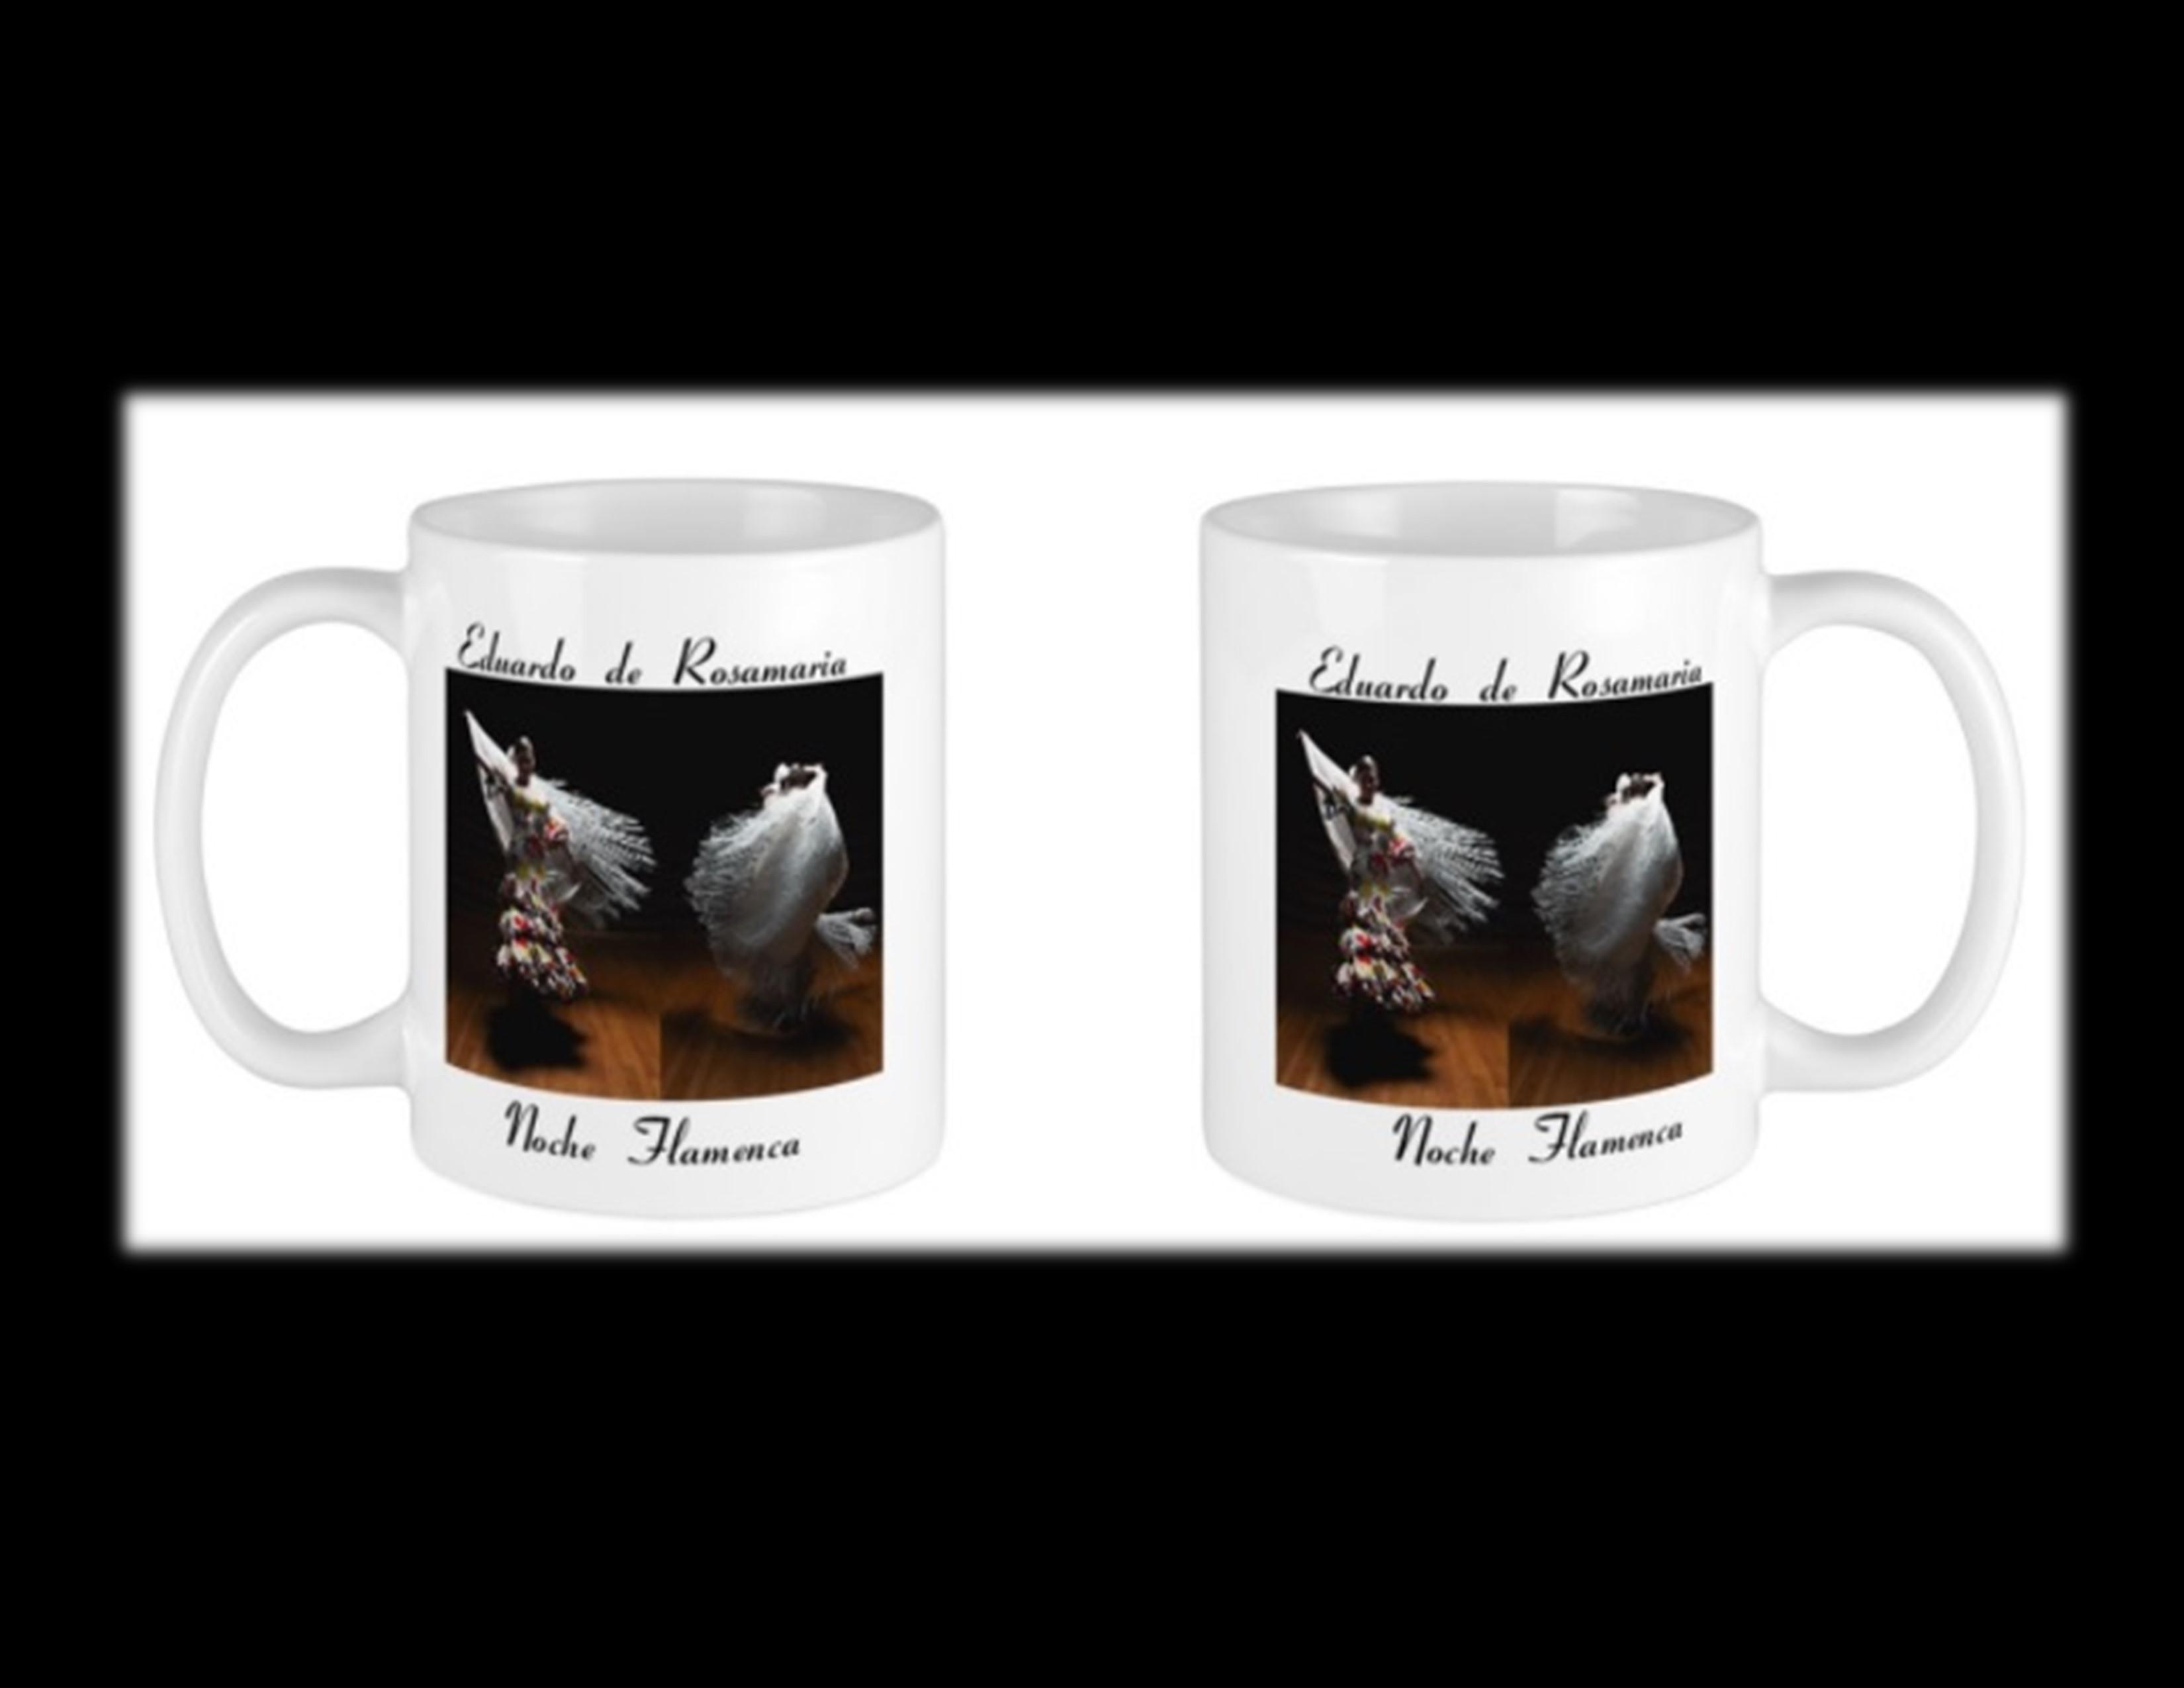 Noche Flameca Coffee Mug